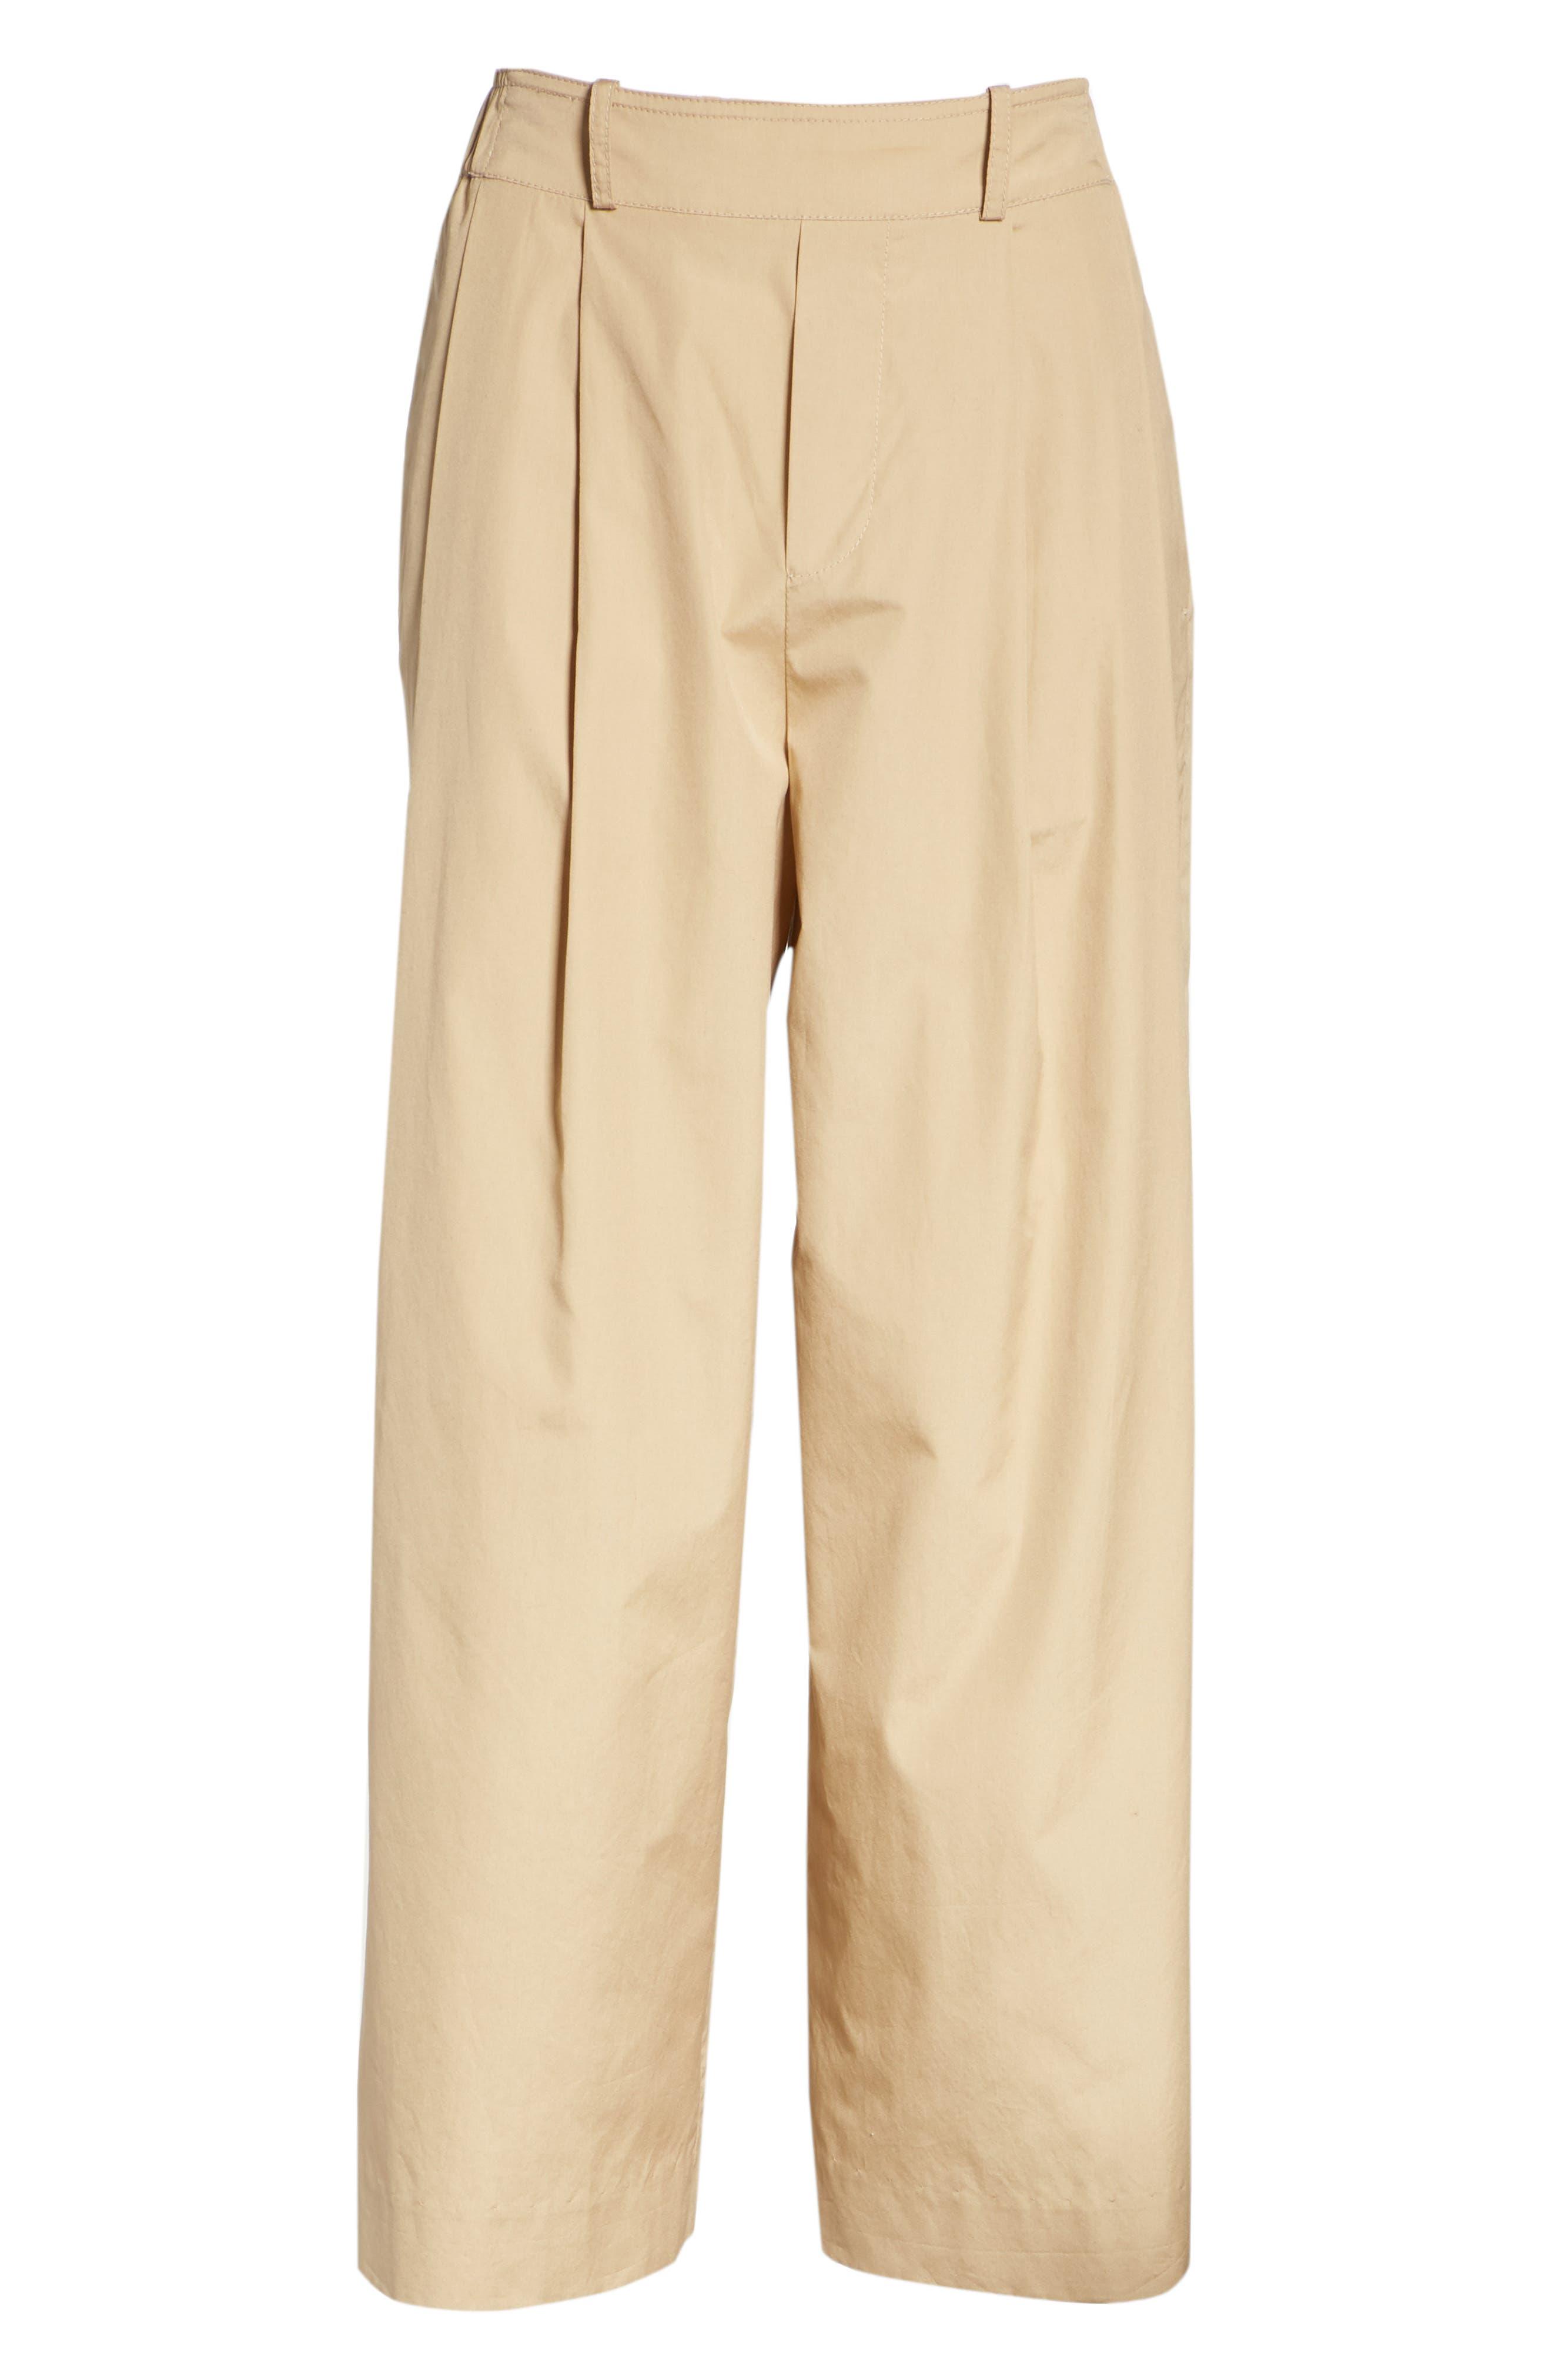 Wide Leg Polished Cotton Pants,                             Alternate thumbnail 6, color,                             KHAKI